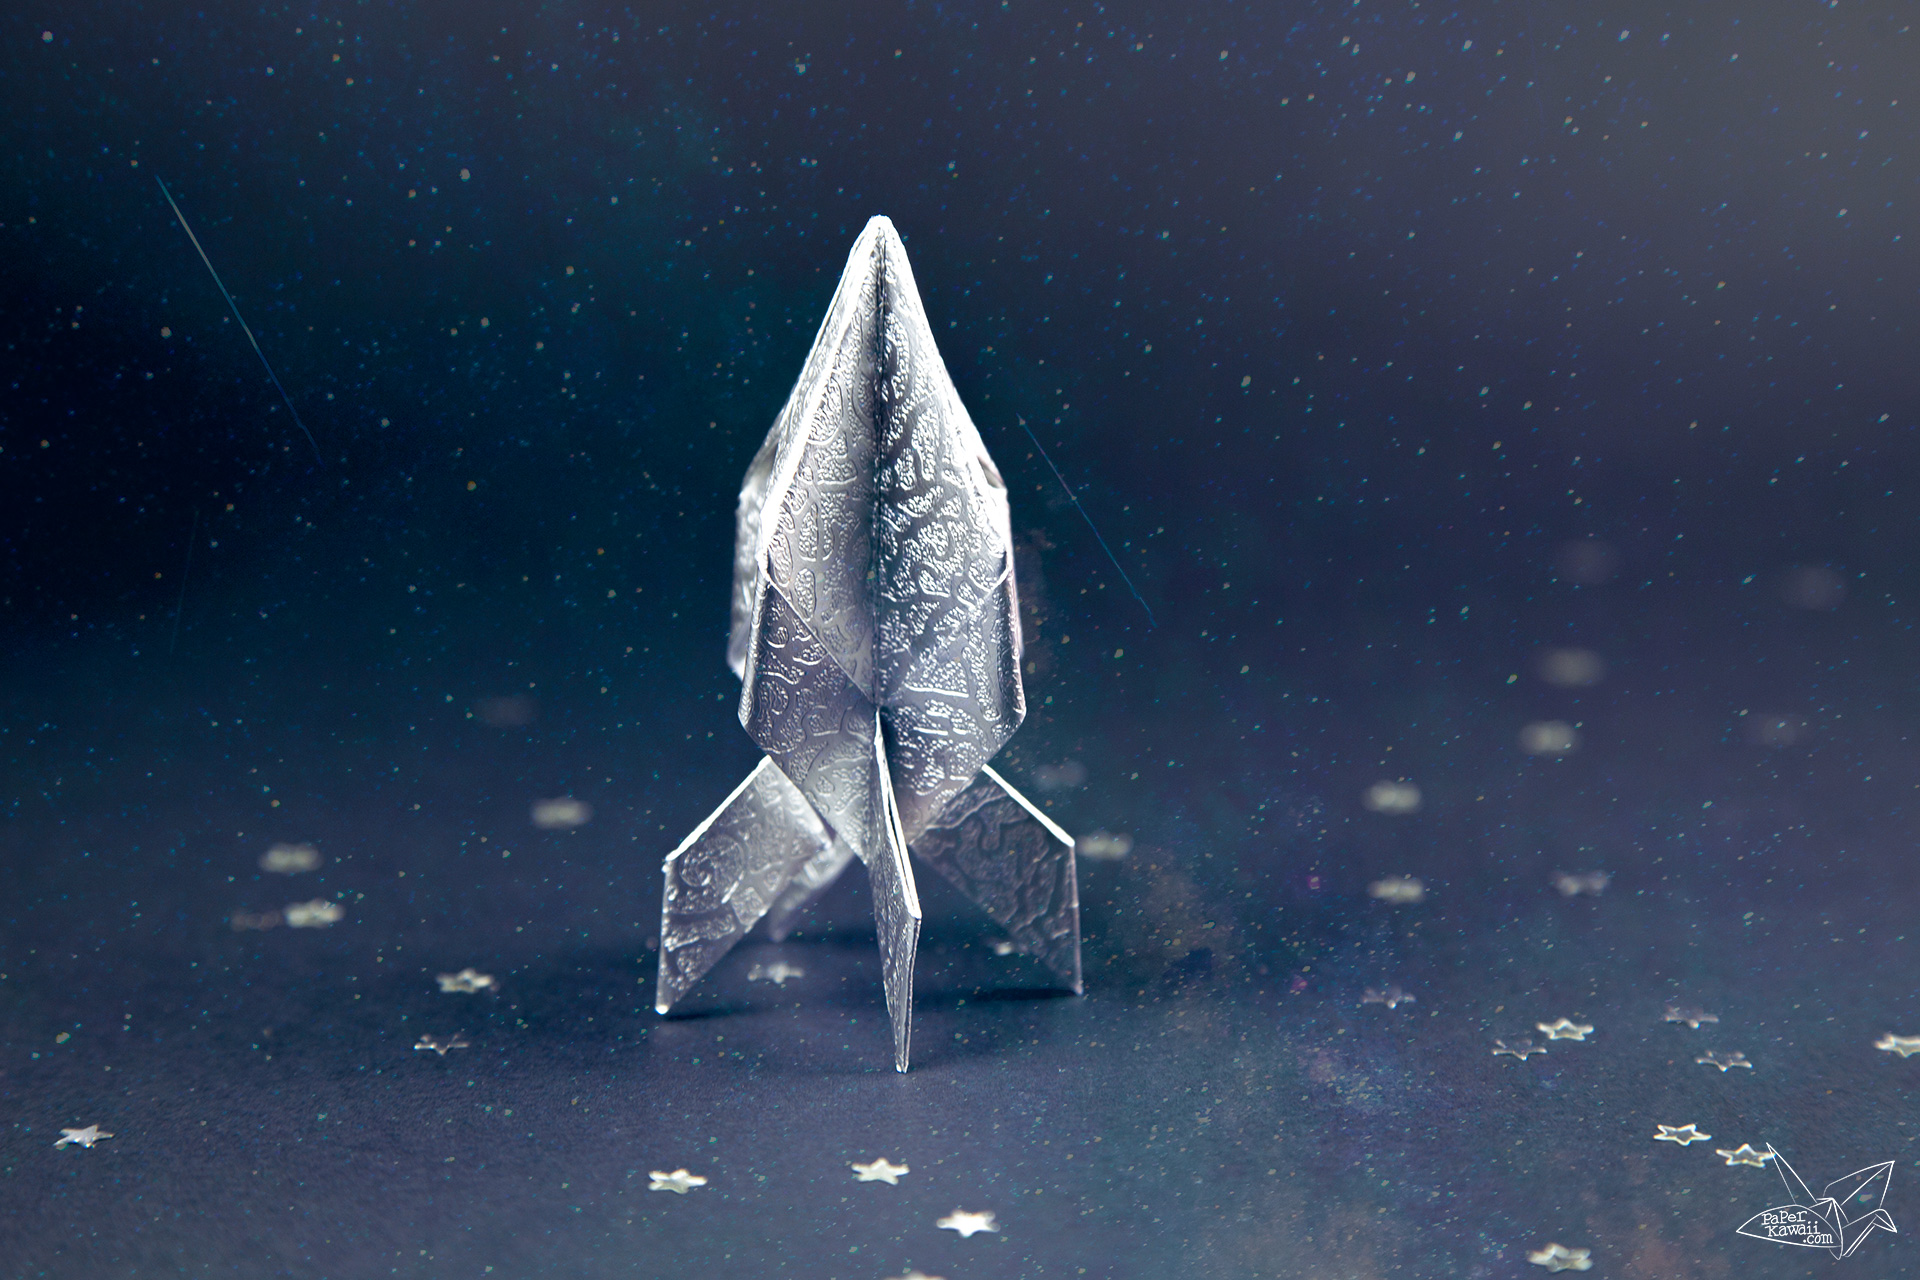 Origami Spaceship Tutorial - Origami Rocket - Paper Kawaii